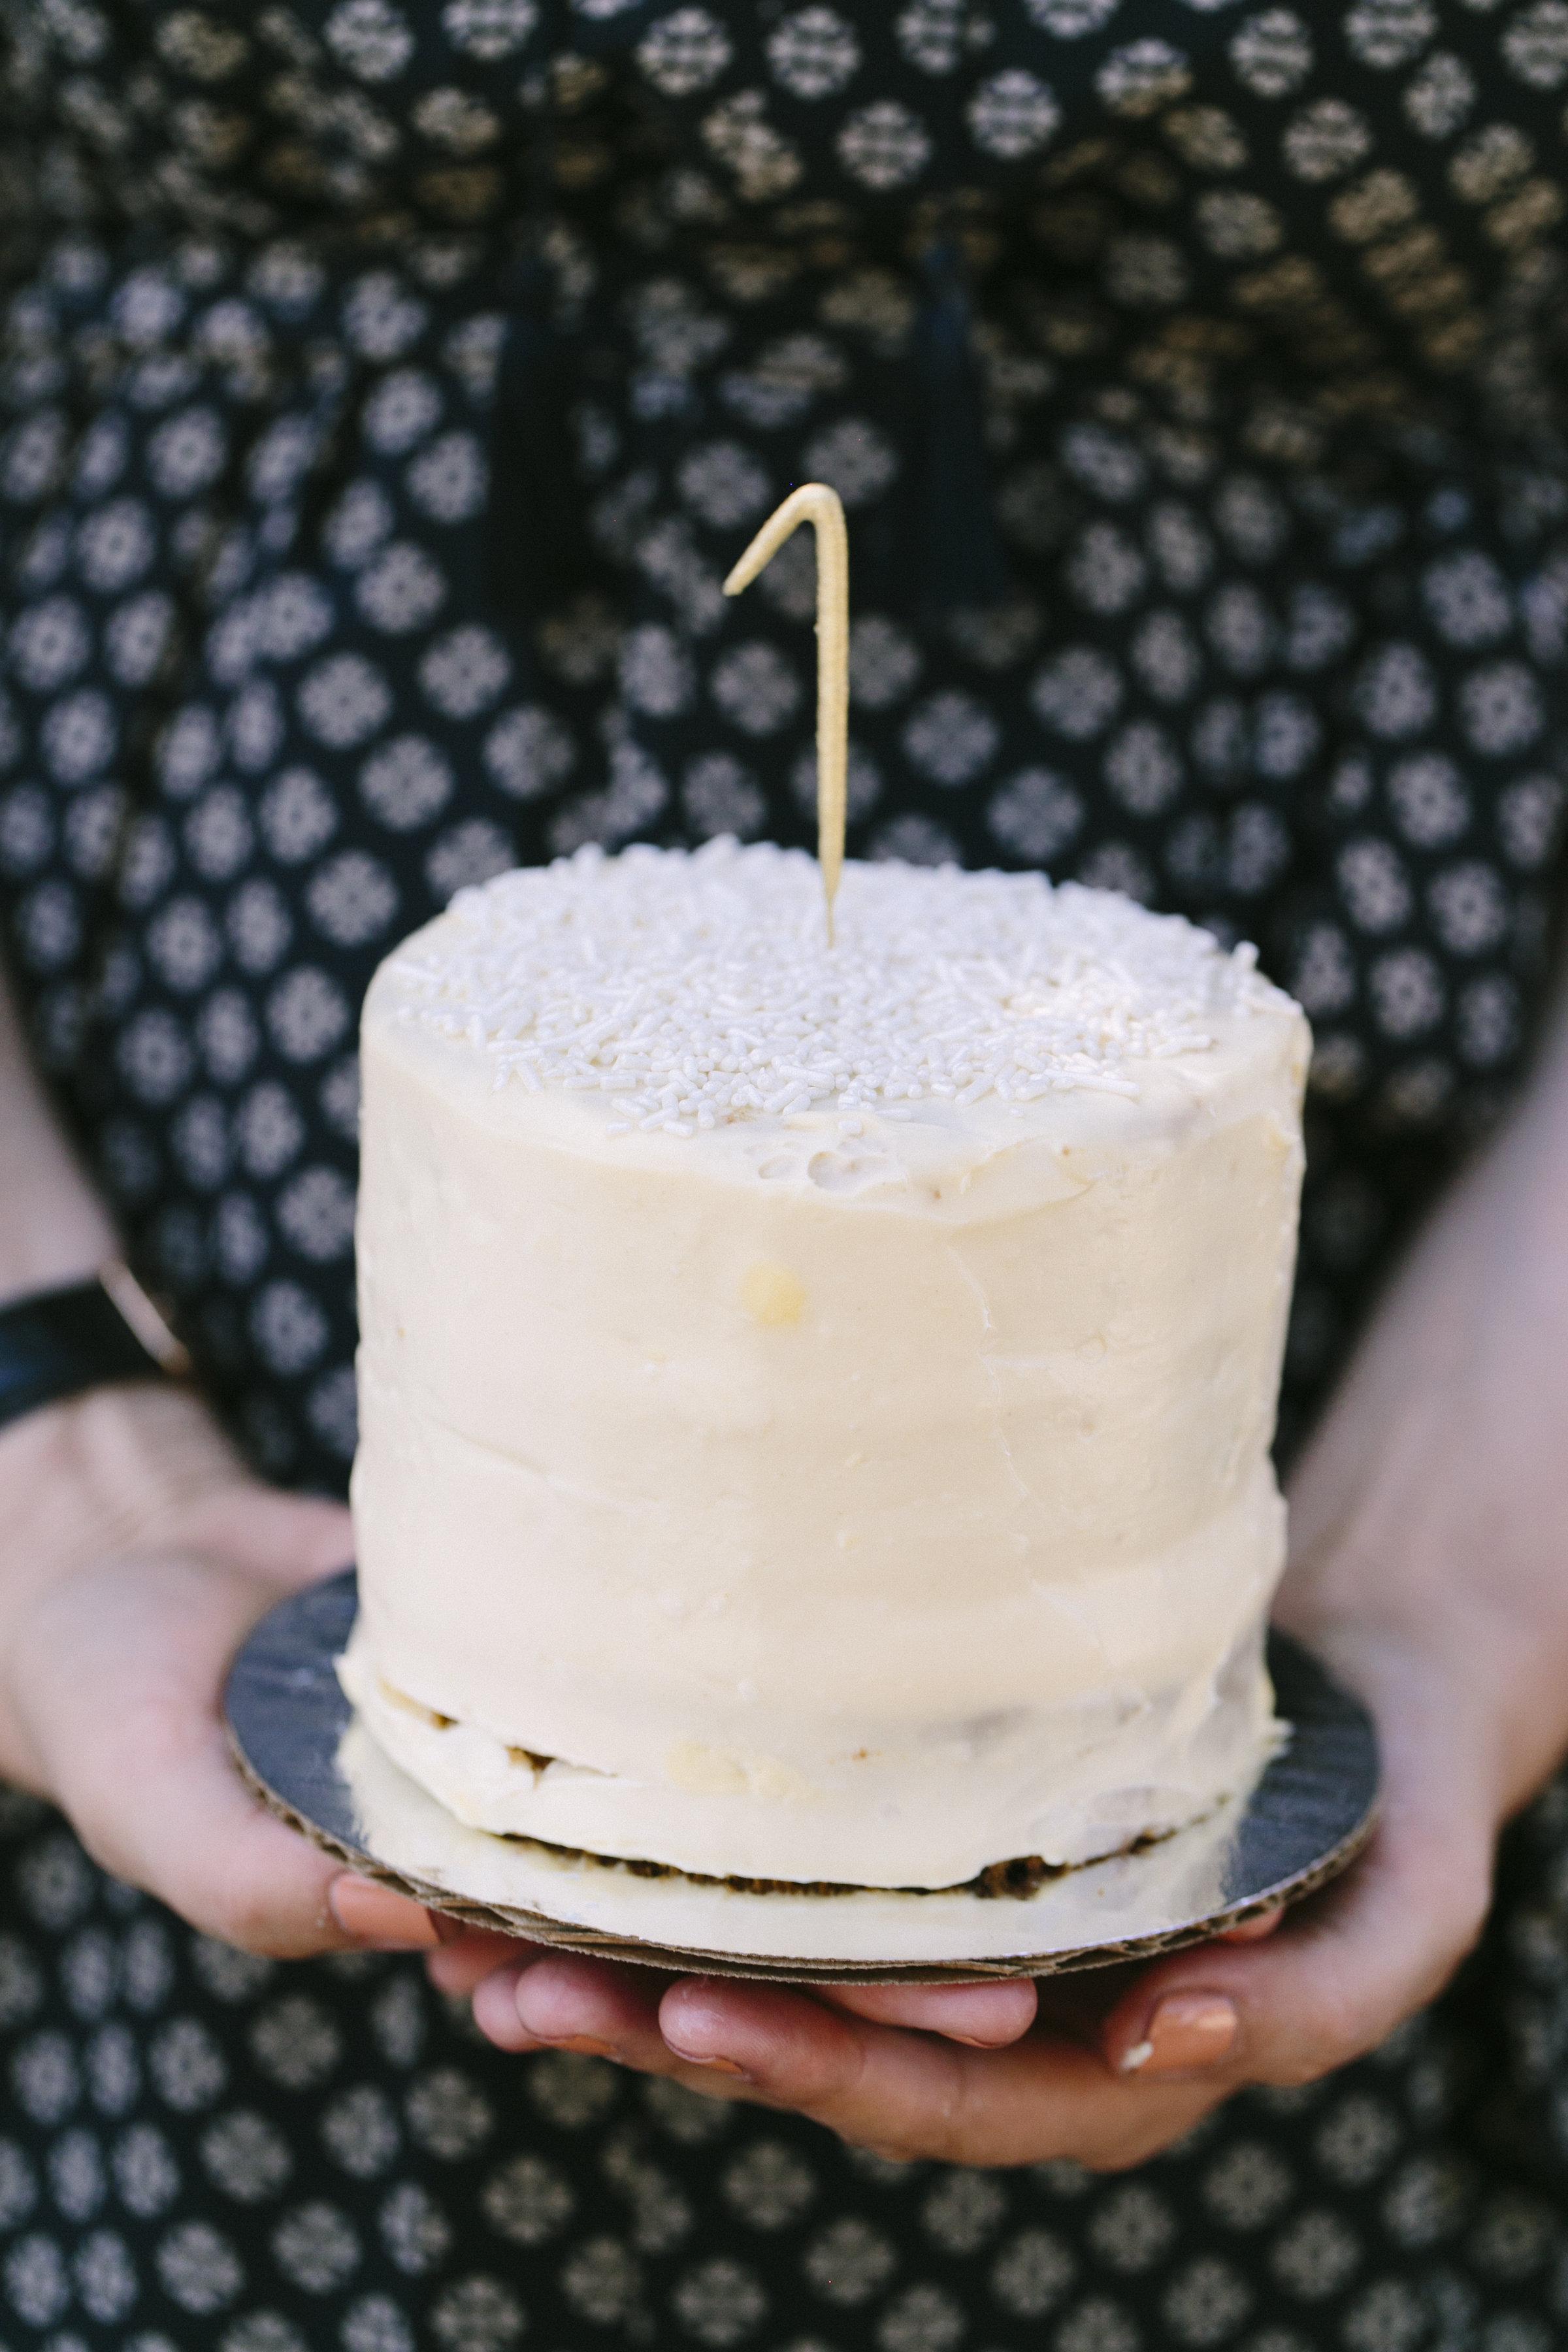 First birthday cake with mashed banana, orange juice, and maple